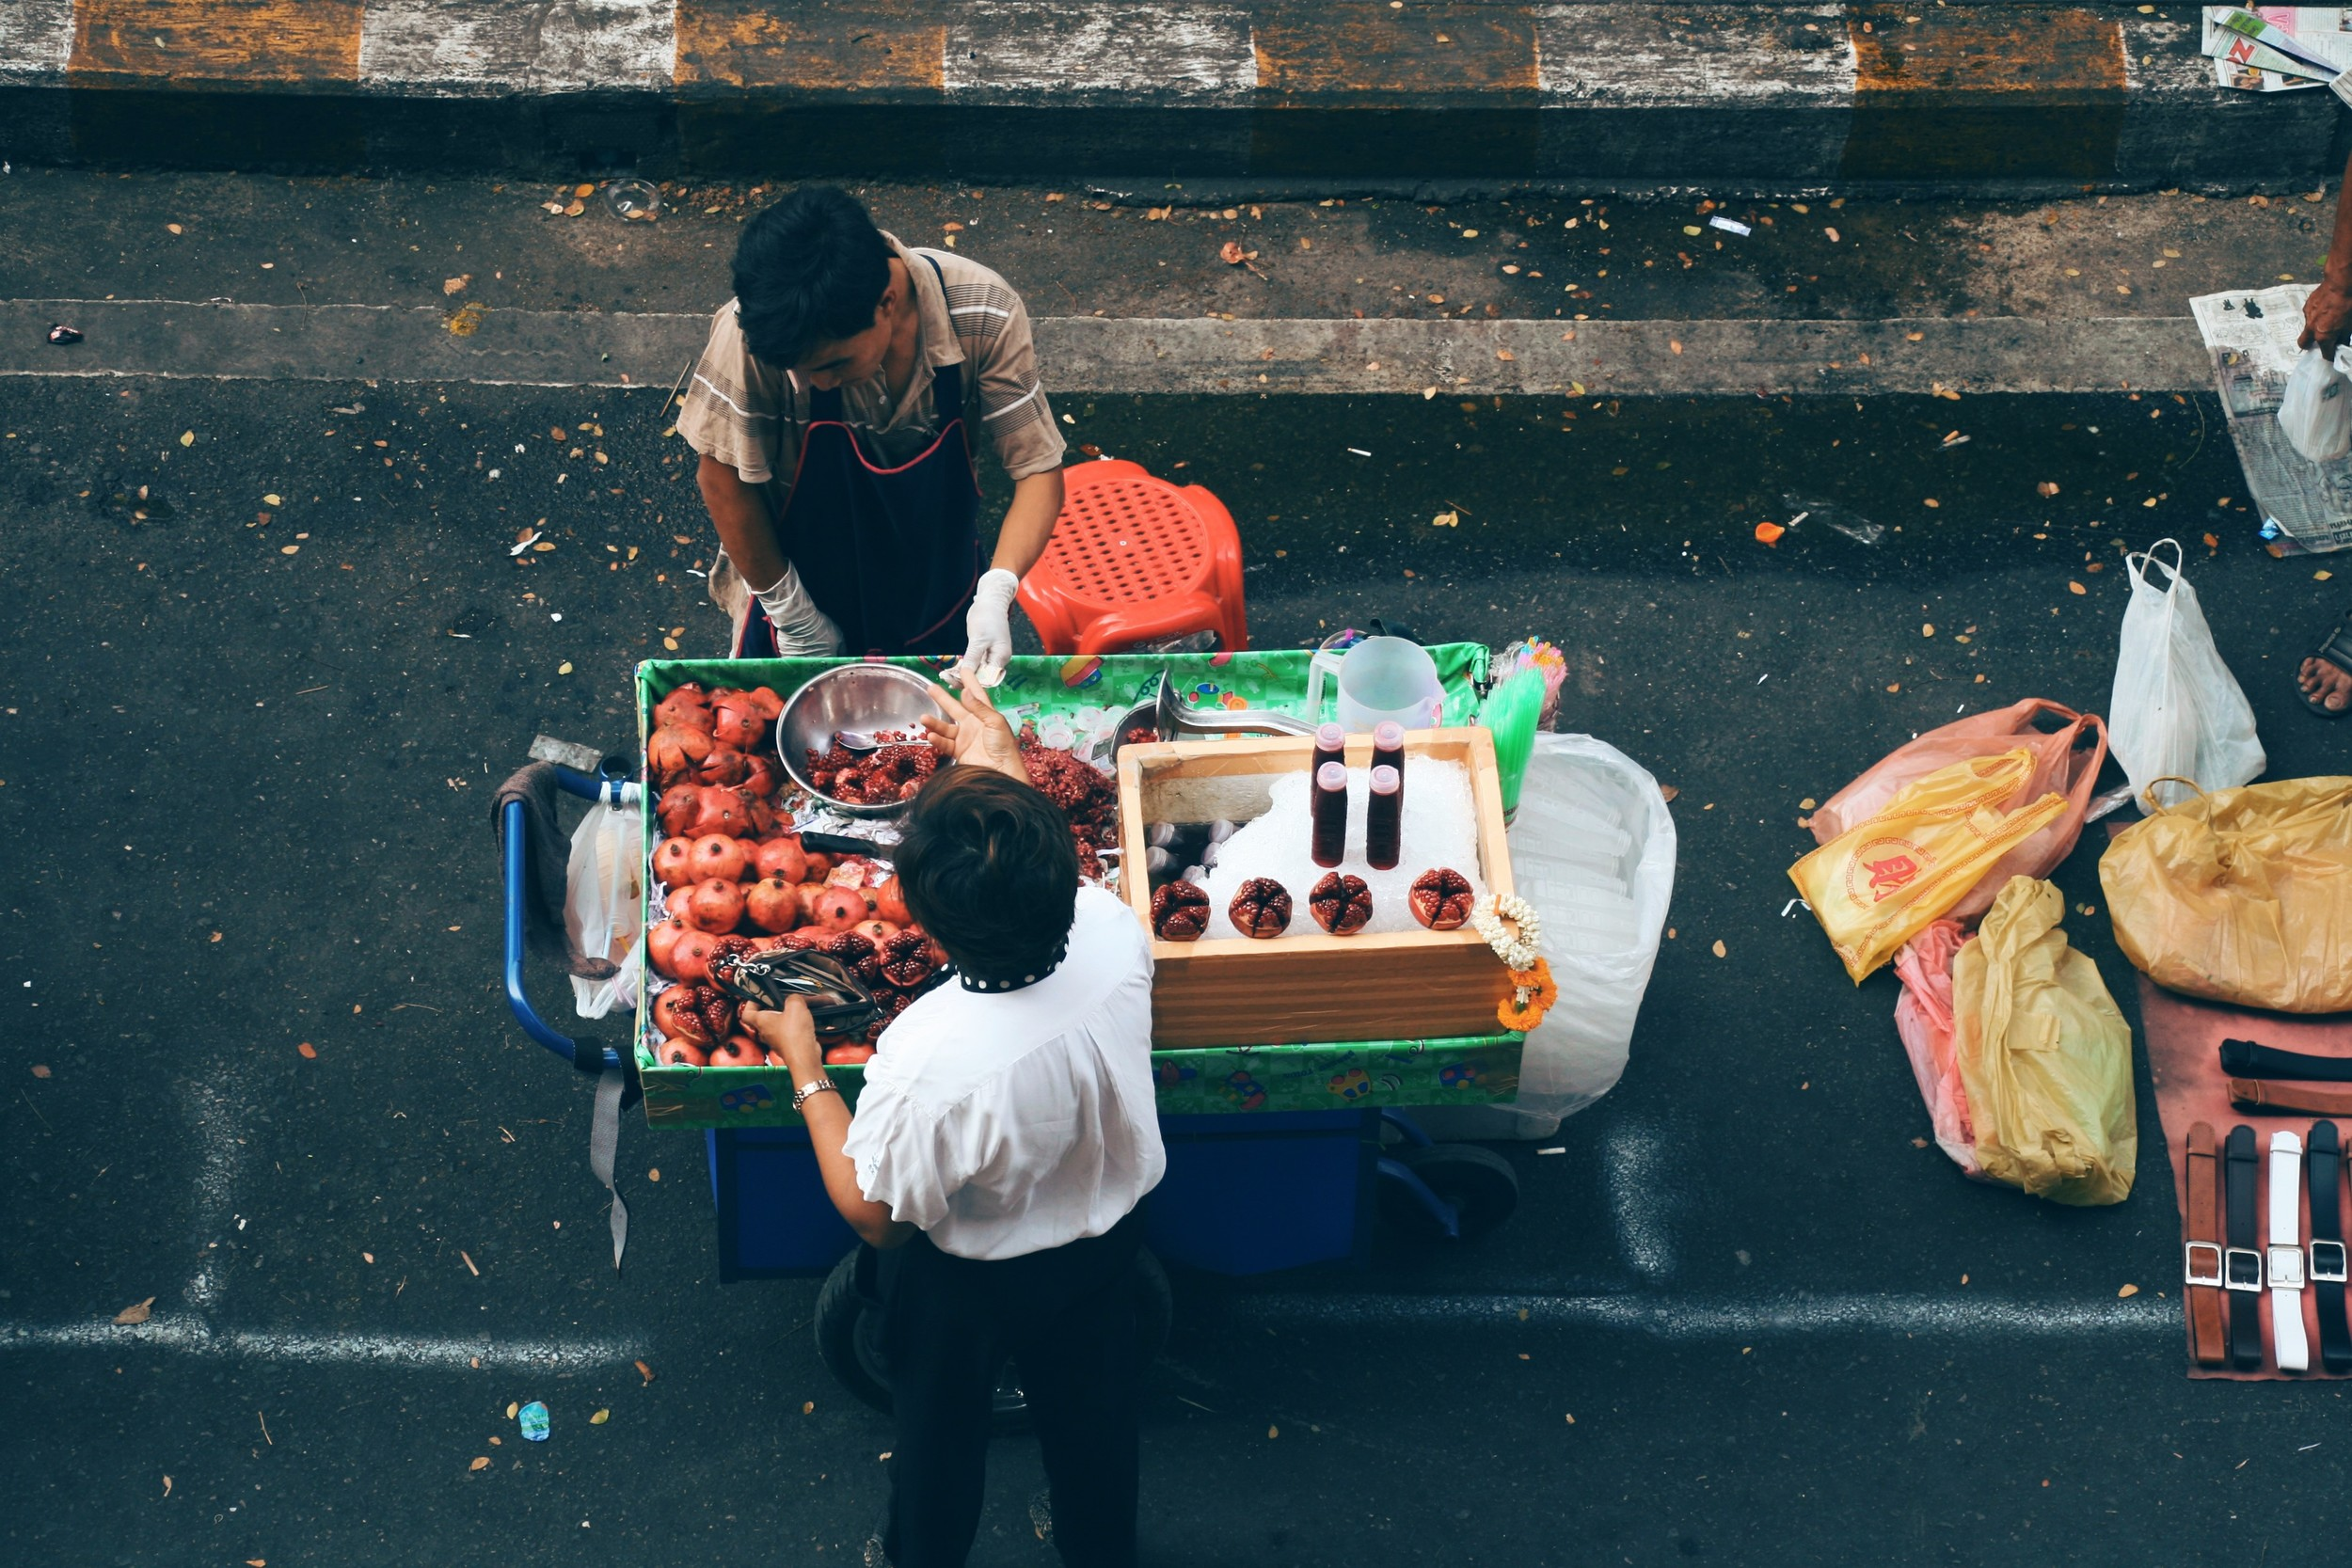 Fresh fruit vendor selling whole pomegranates or juice in a bottle